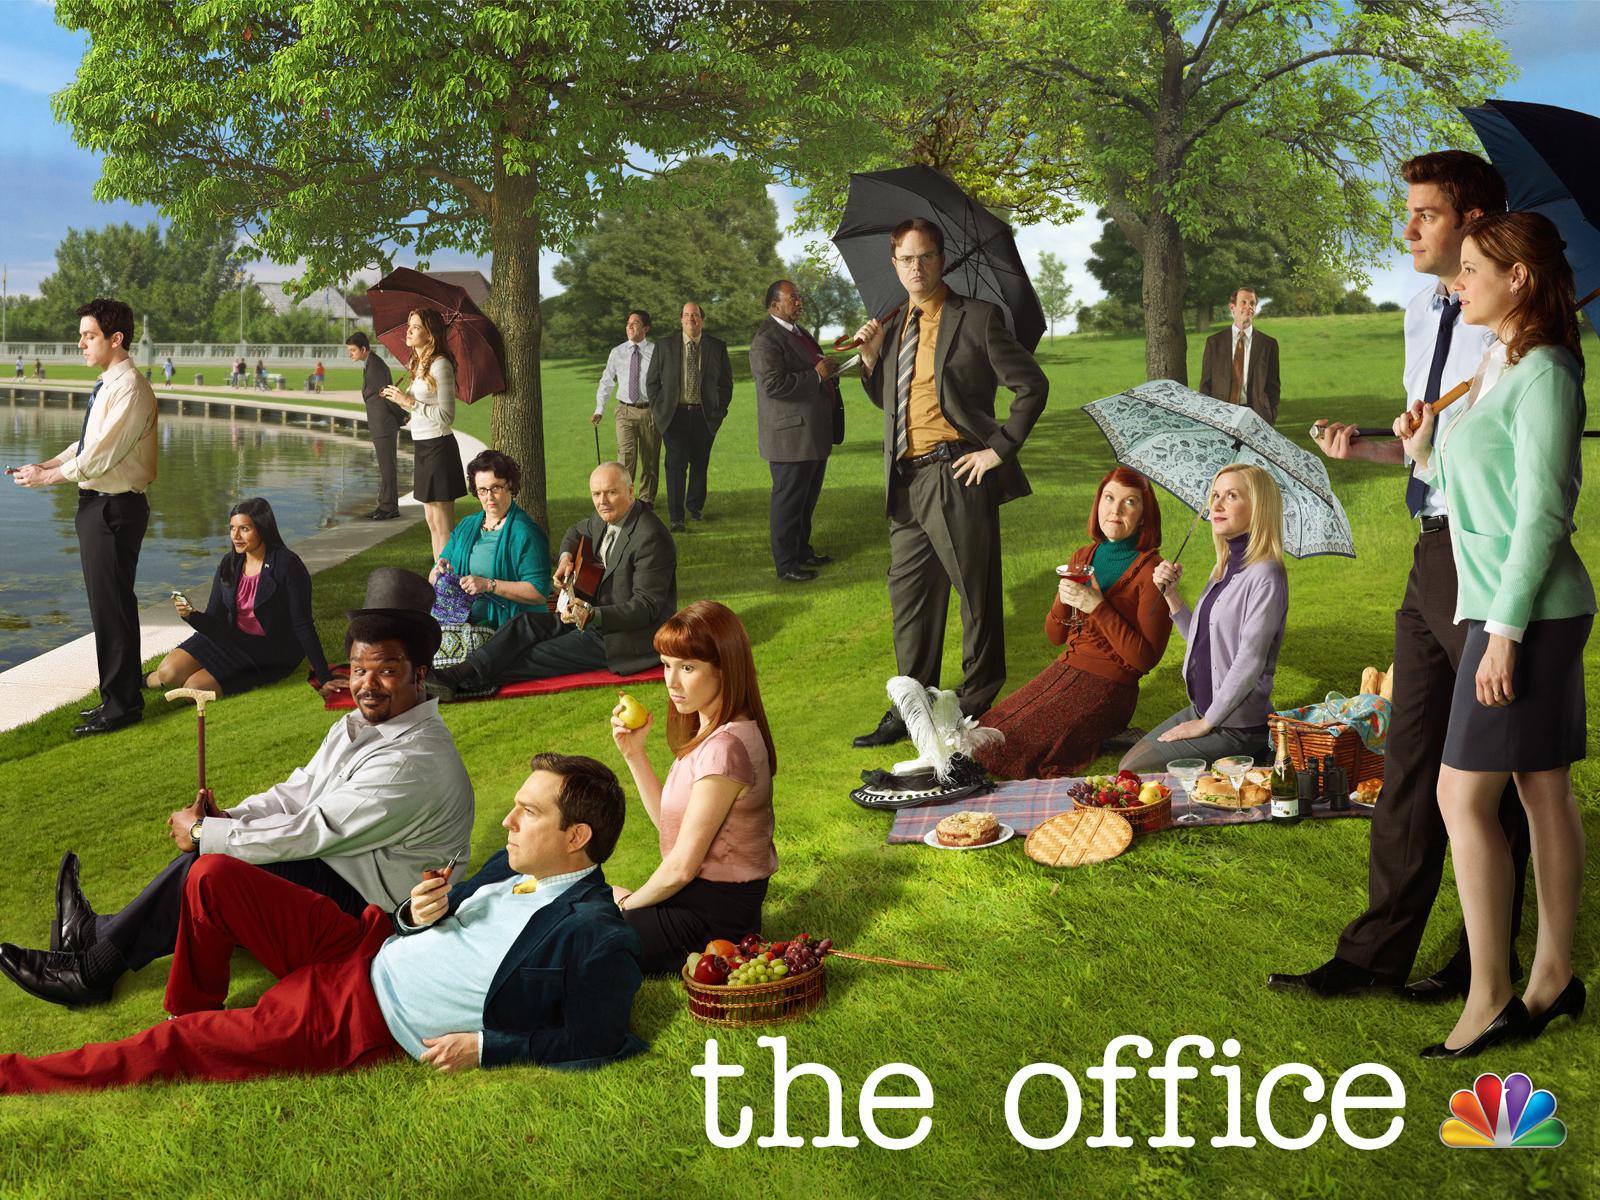 https://kristin2008.files.wordpress.com/2012/12/a-sunday-afternoon-on-the-island-of-la-grande-jatte-office-style-the-office-22112286-1600-1200.jpg